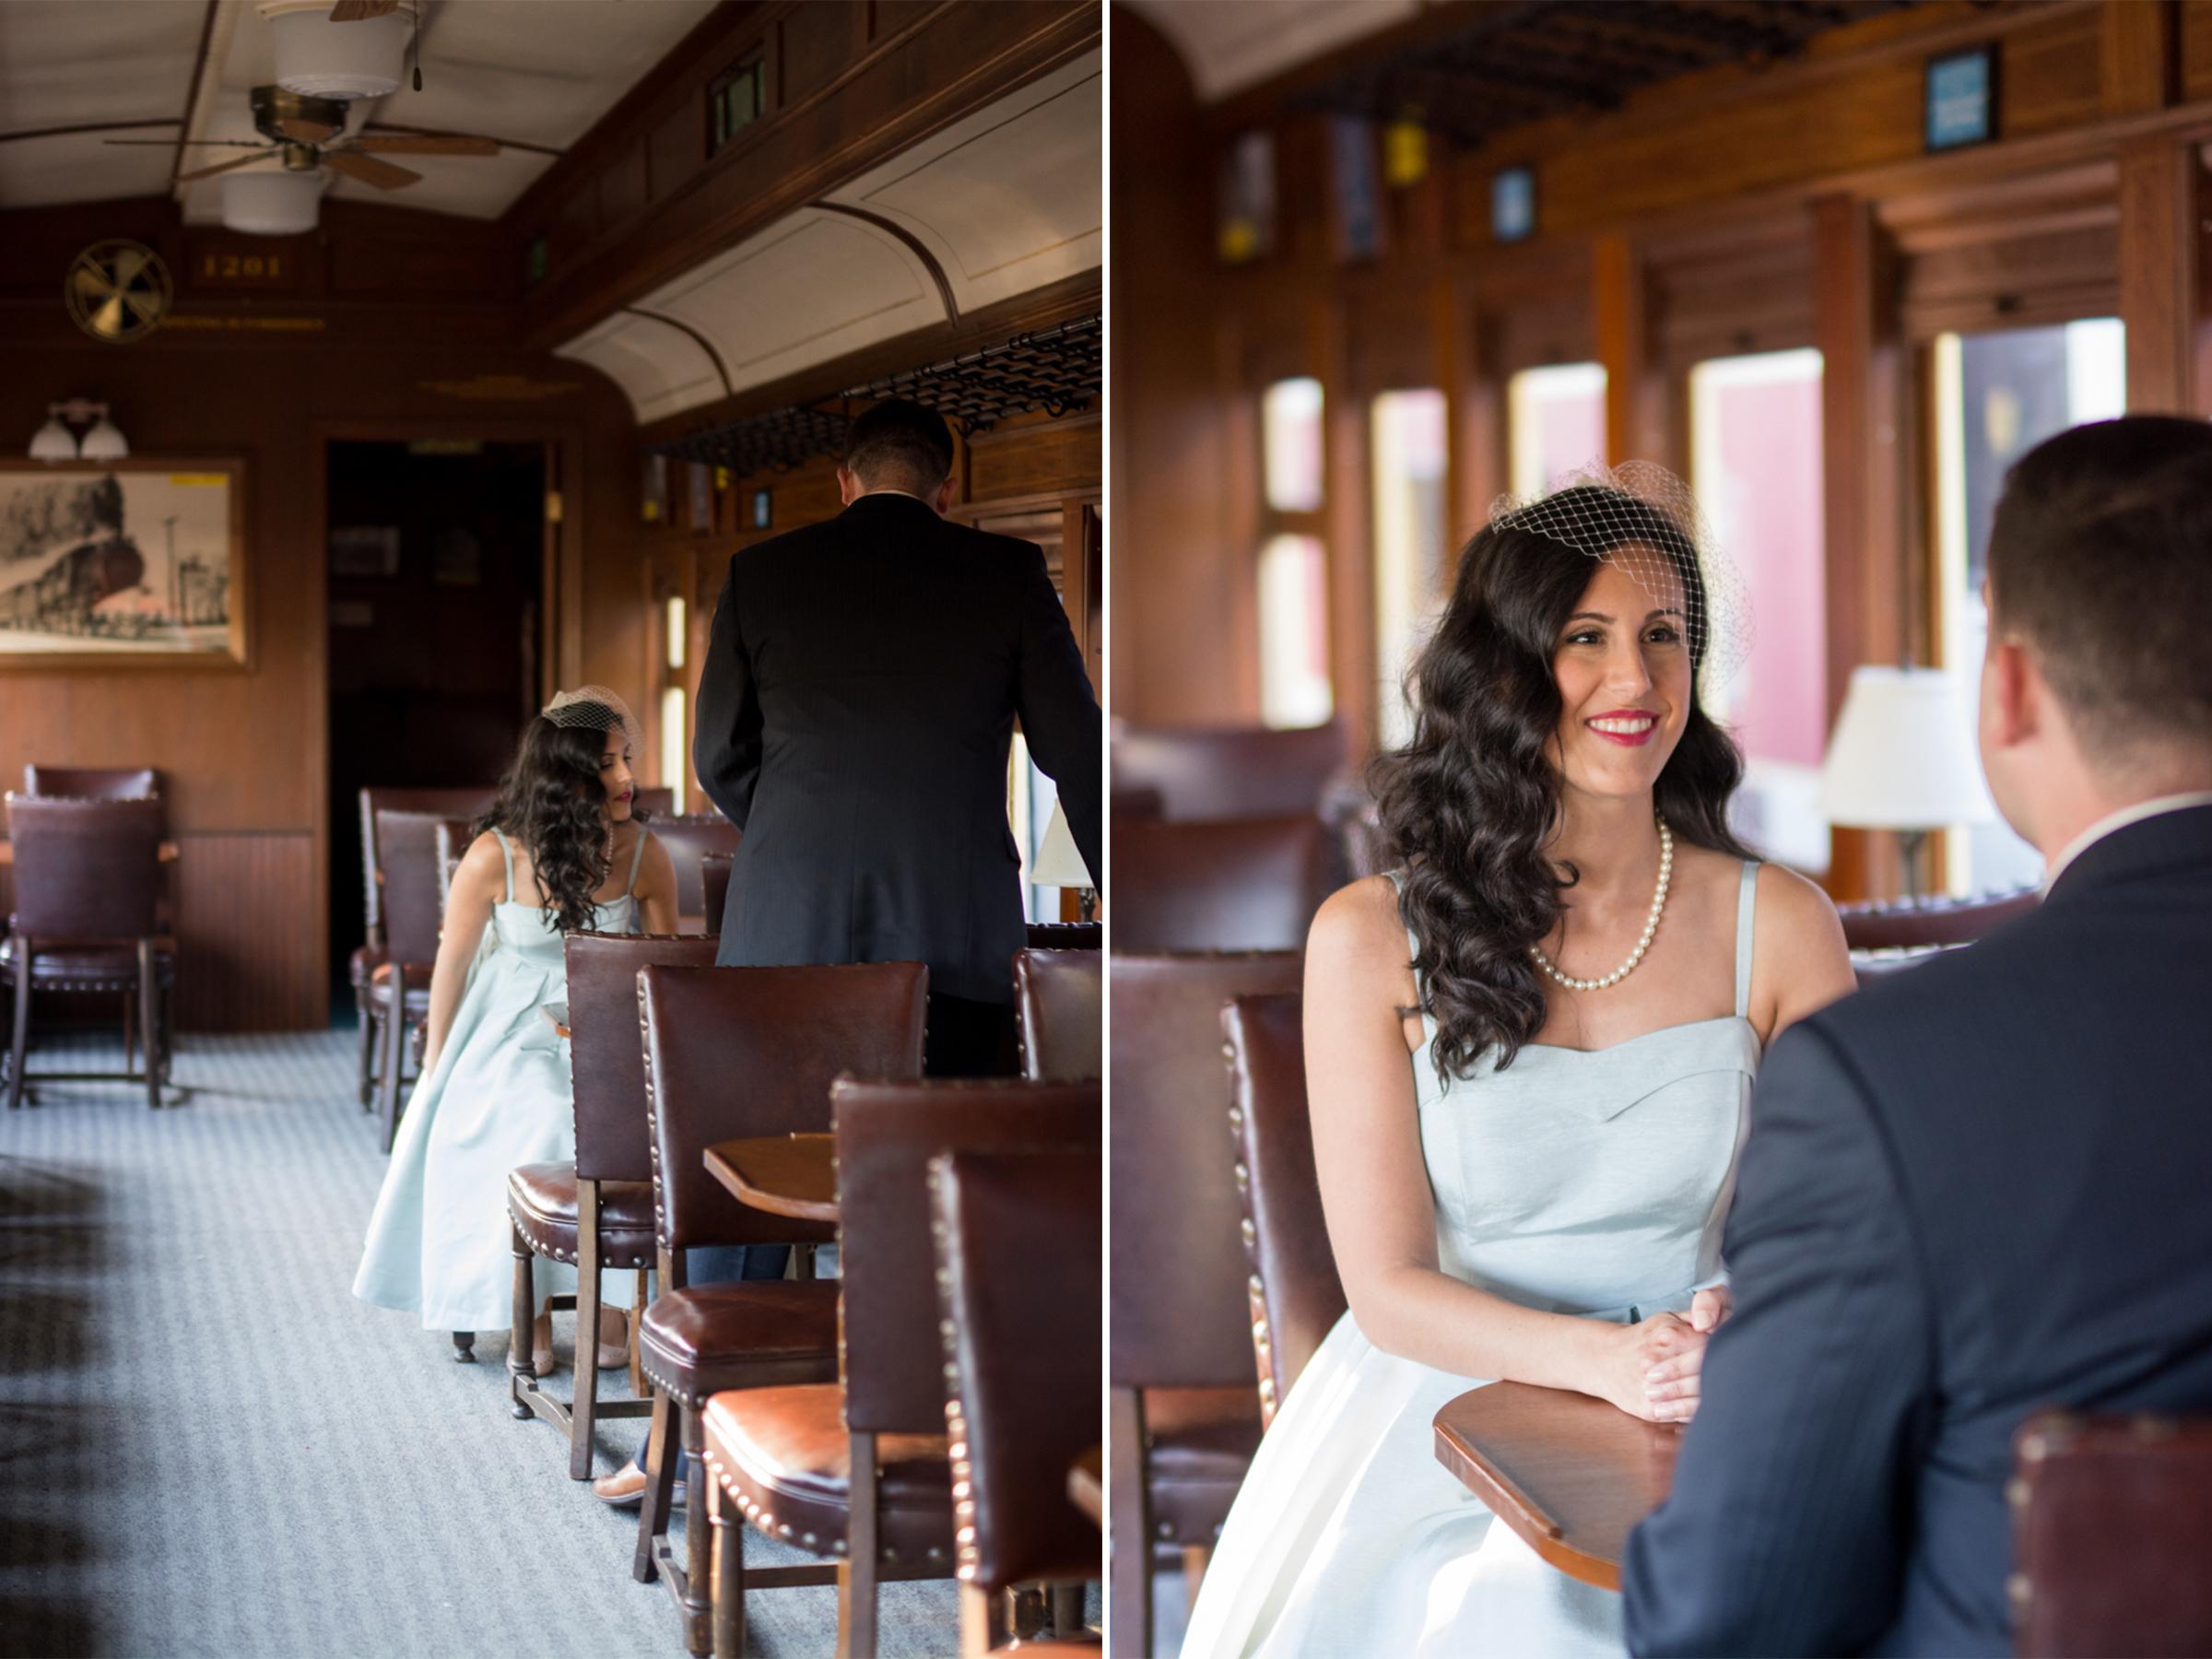 M+J Engagement Photos 3- Whippany Railway Museum- New Jersey -Olivia Christina Photography.jpg